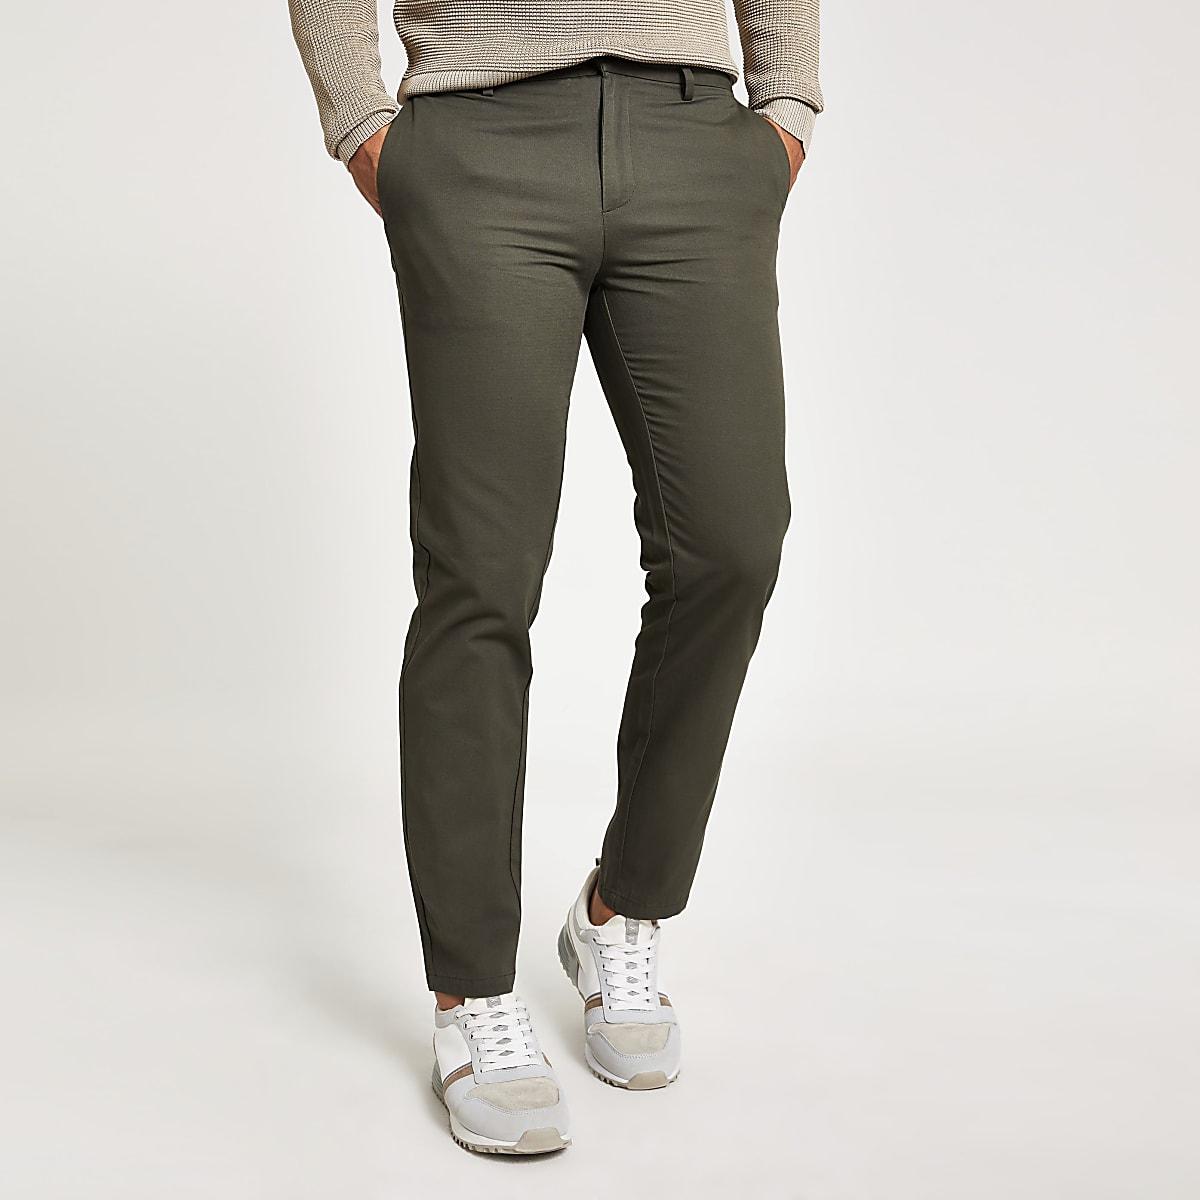 Khaki slim Dylan chino trousers